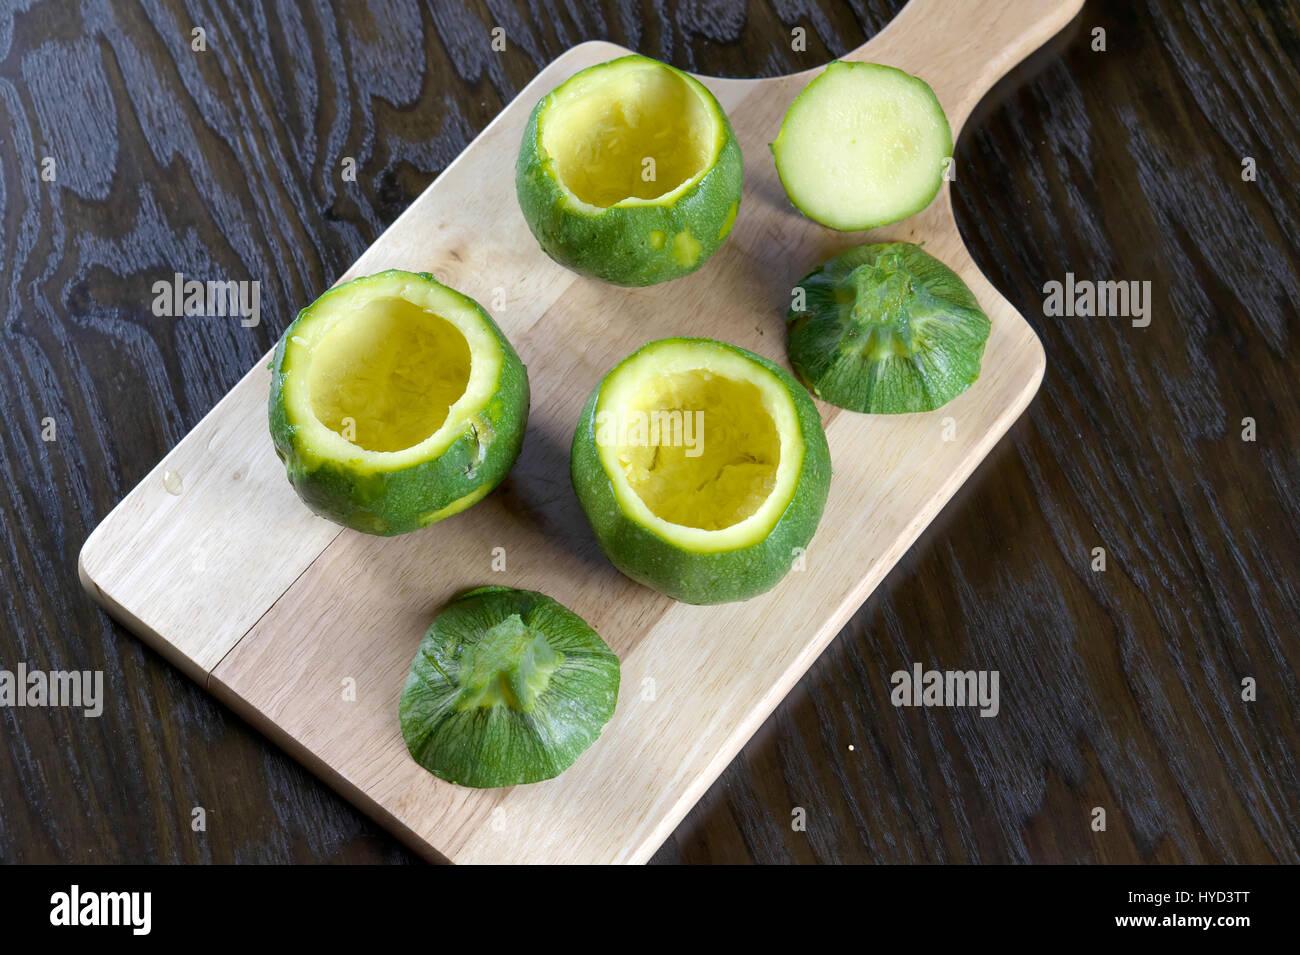 Emptied round zucchini on wooden cutting board lying on dark wooden table - Preparing stuffed zucchini recipe - Stock Photo